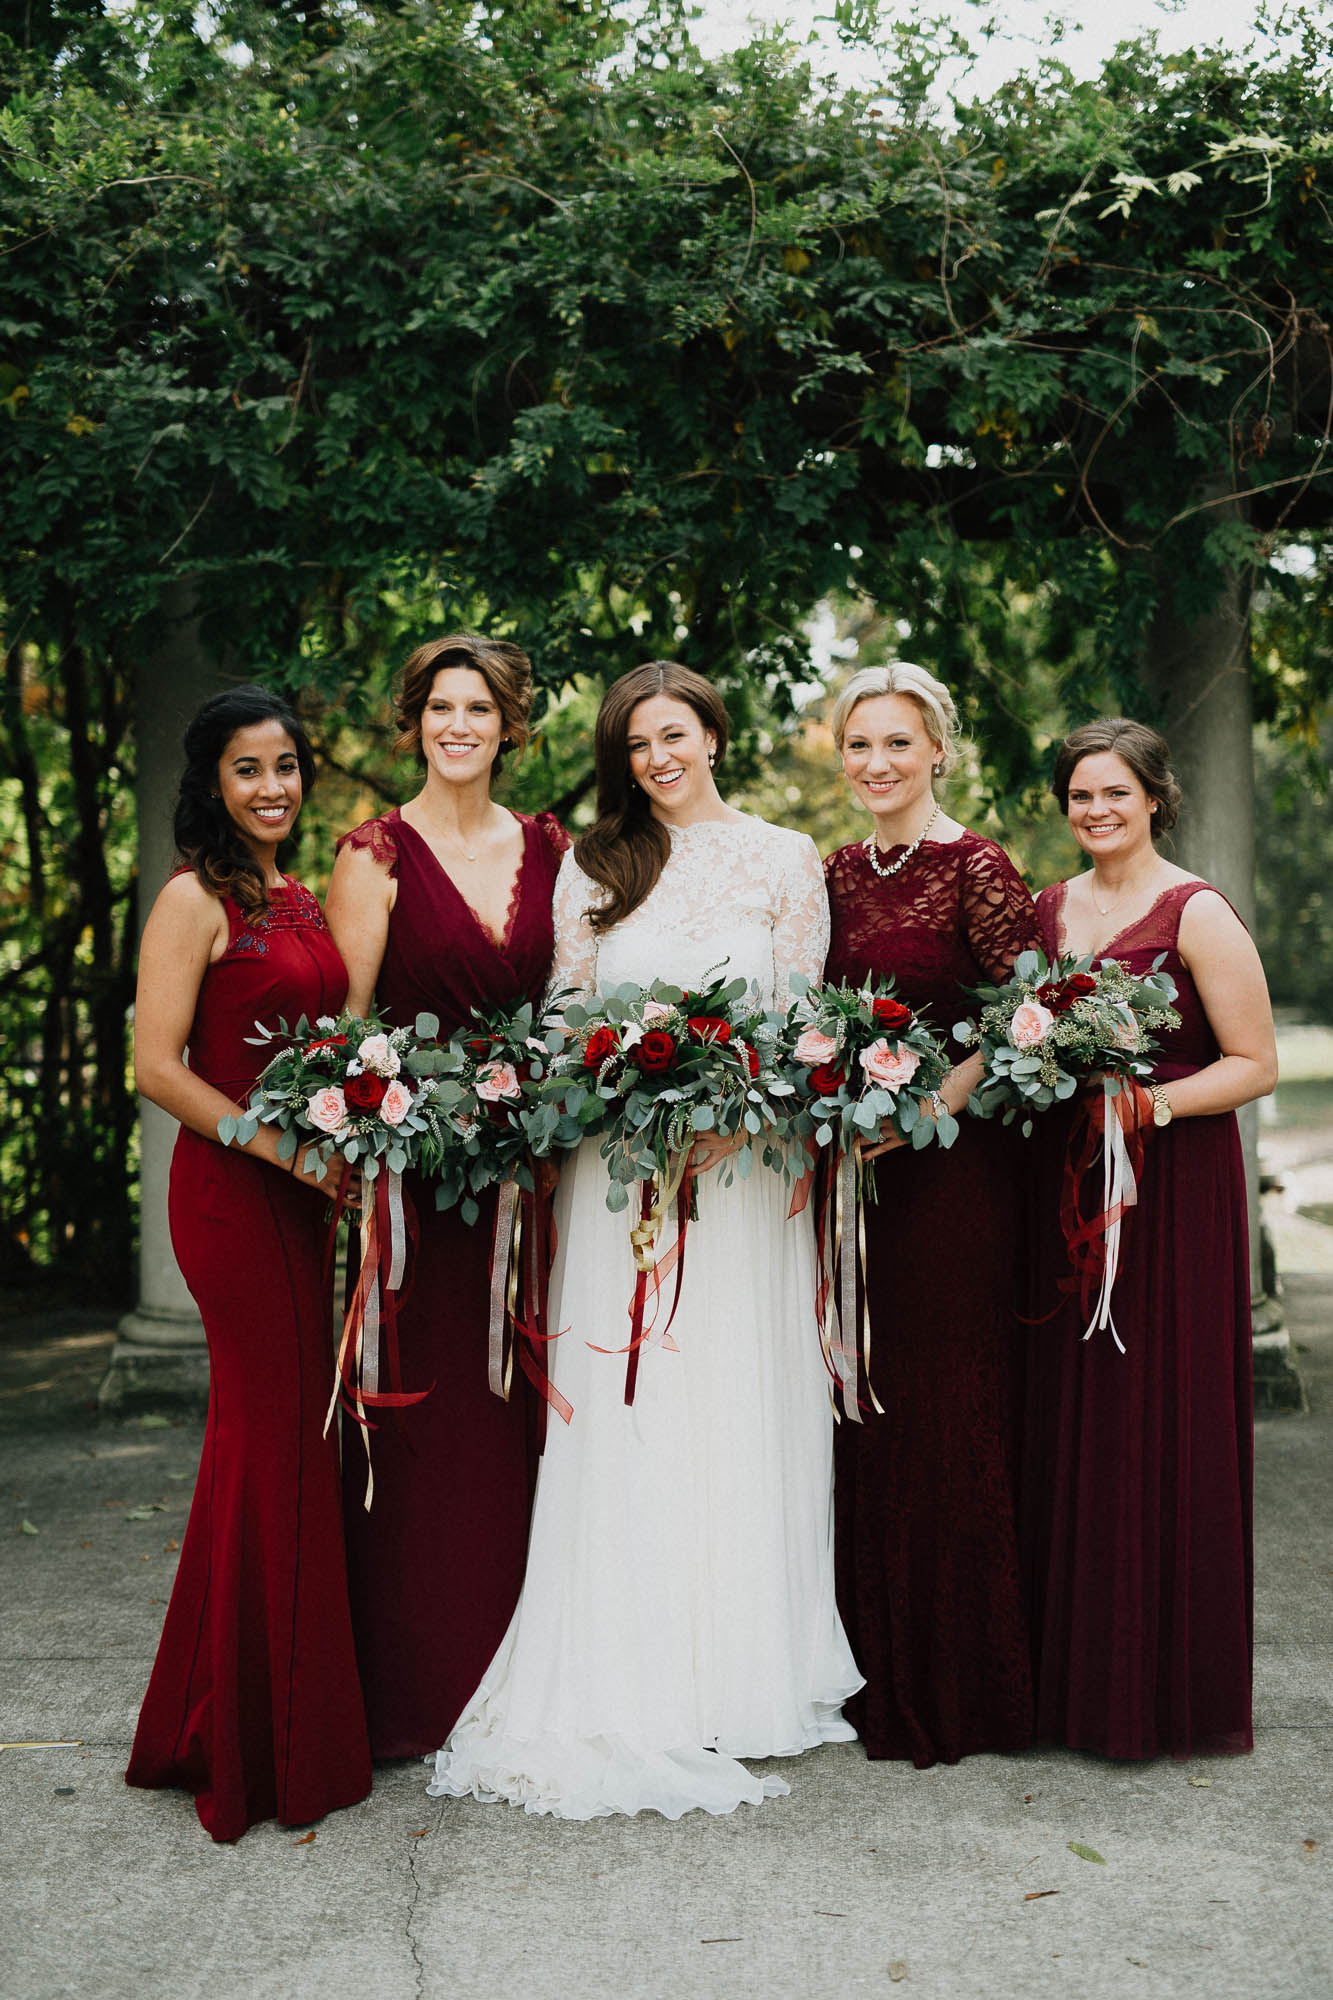 Highline-Car-House-Wedding-Columbus-Kristin-Aaron-039.jpg